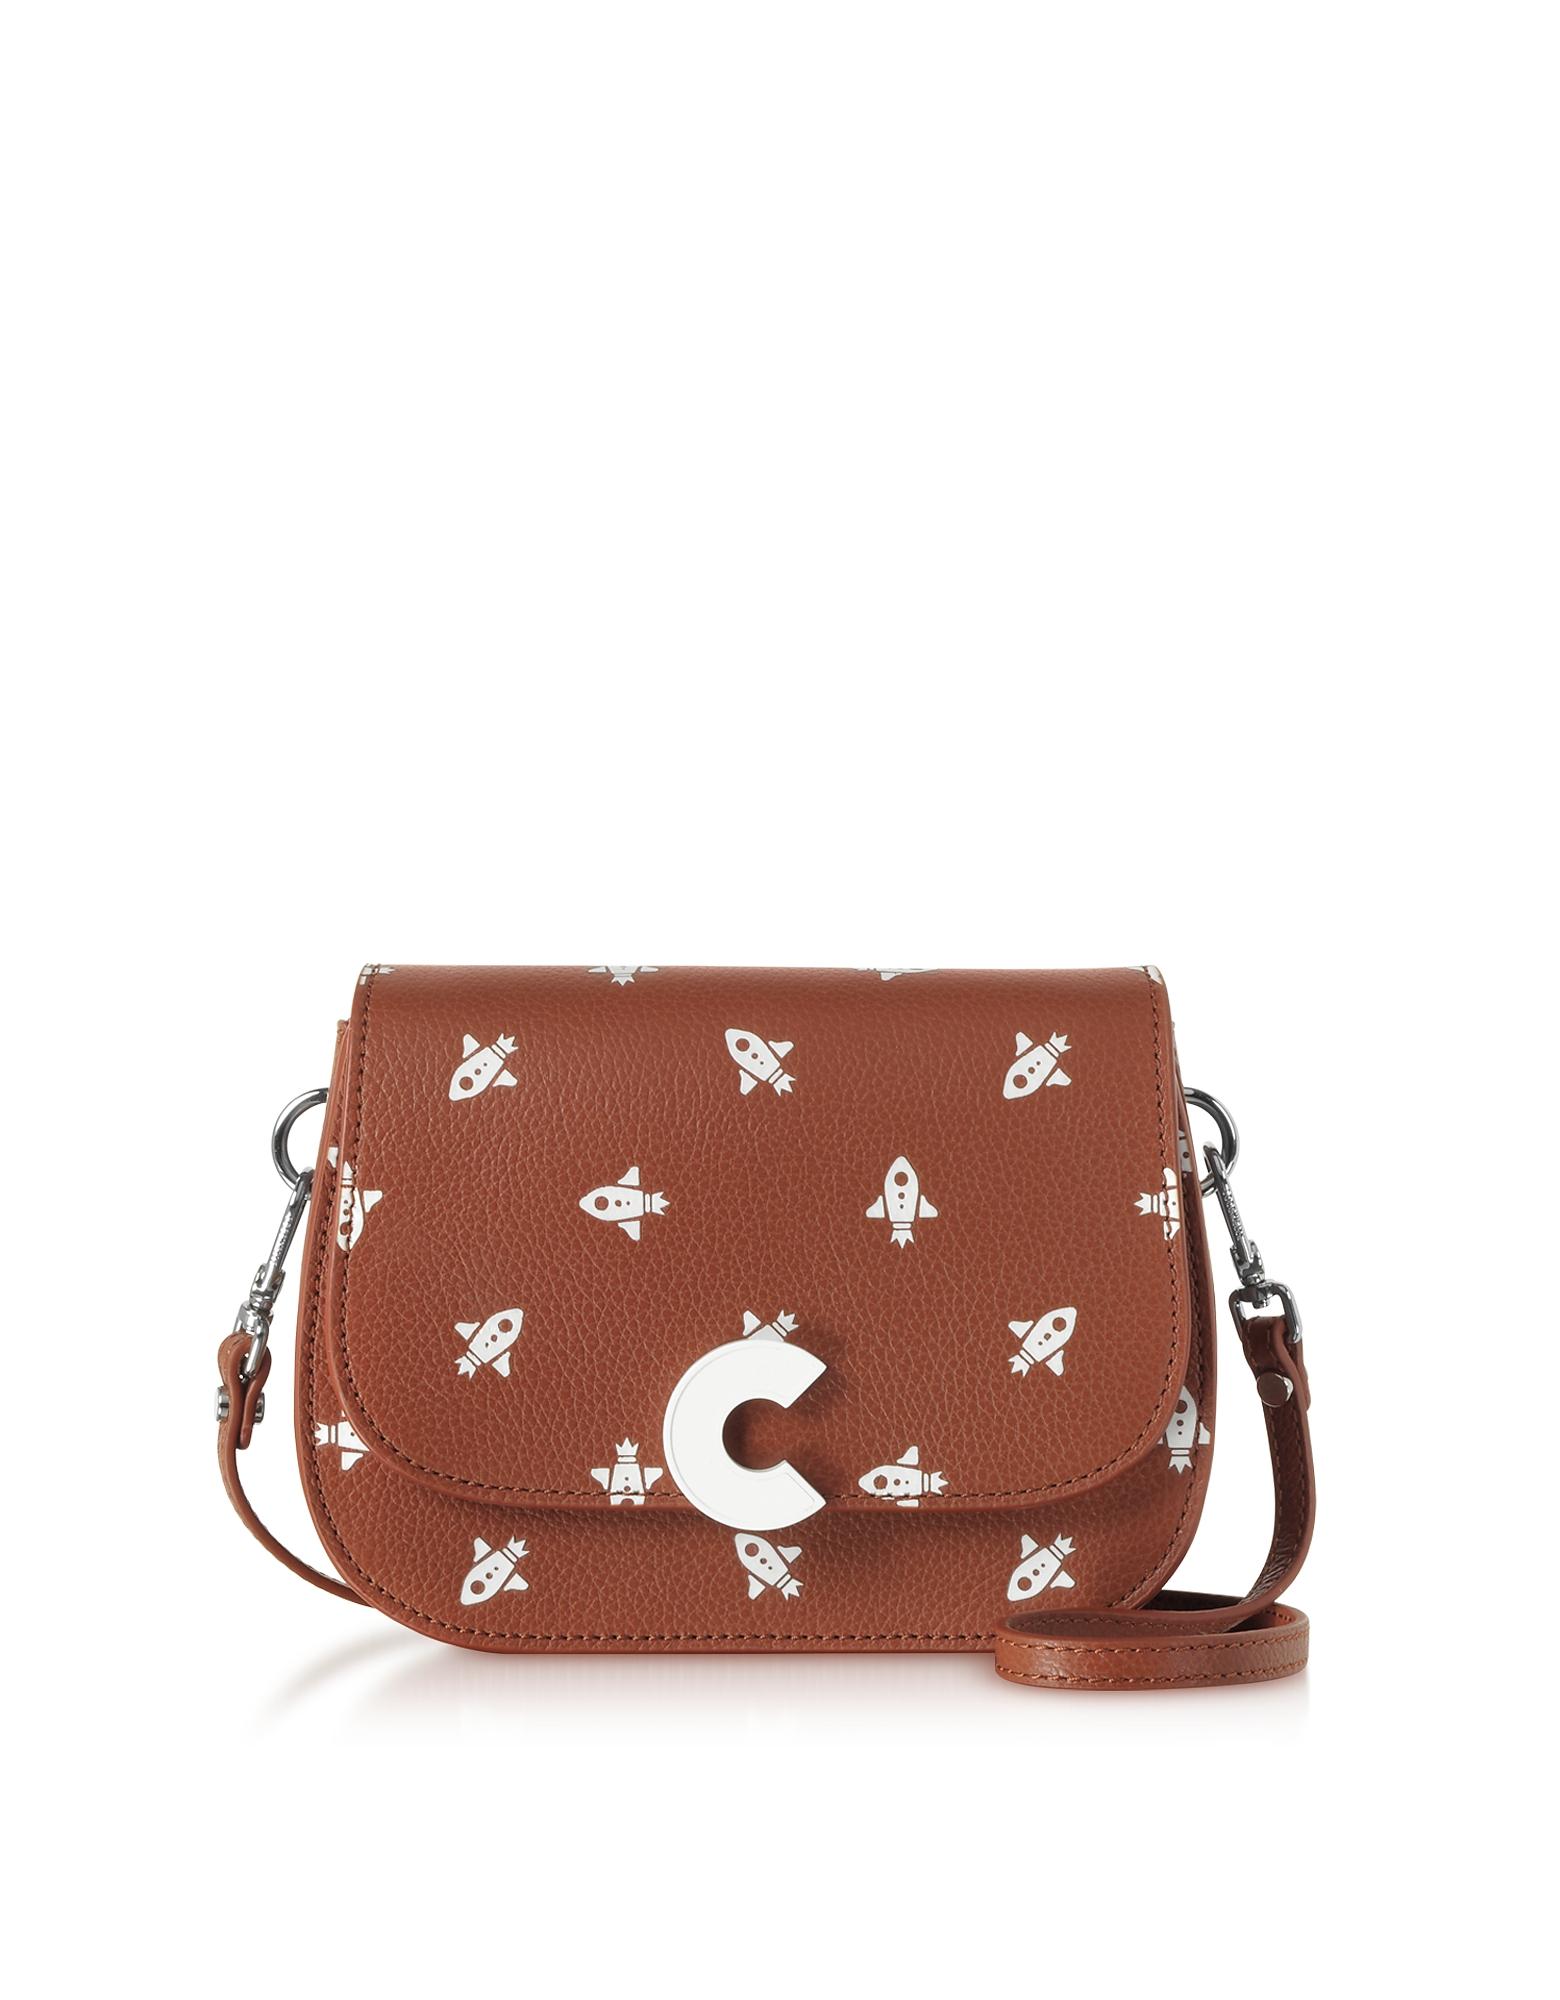 Craquante Razzo Printed Leather Small Shoulder Bag